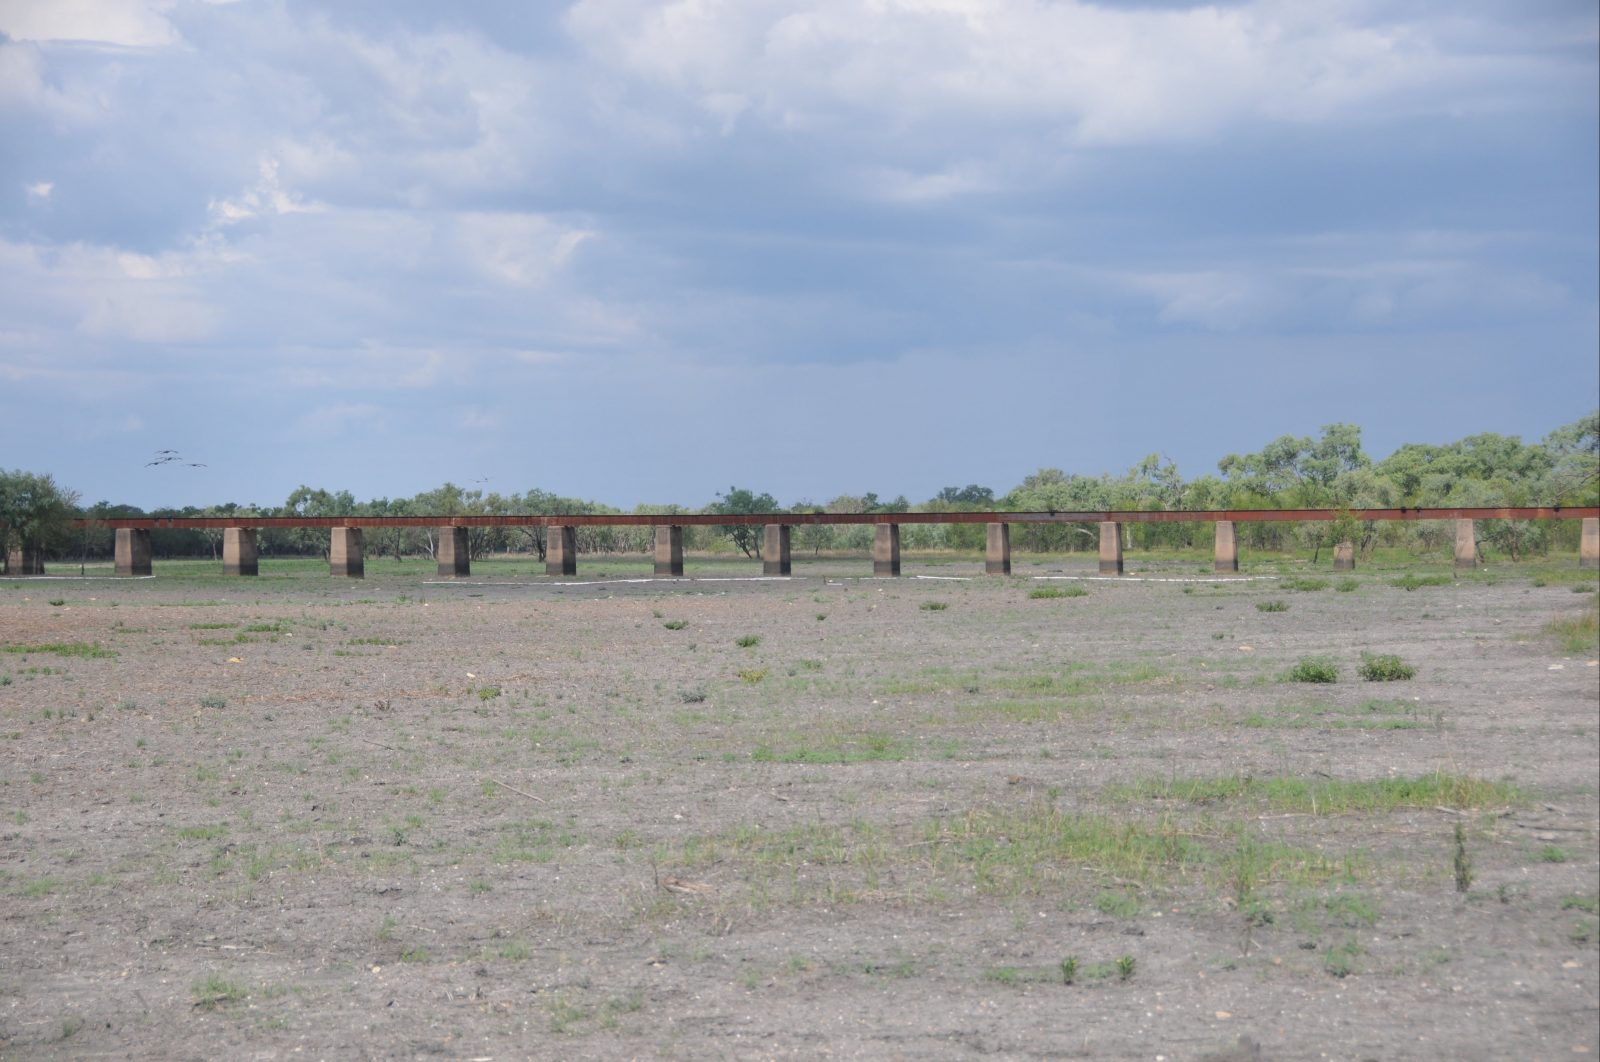 Railway bridge over Warloch Ponds